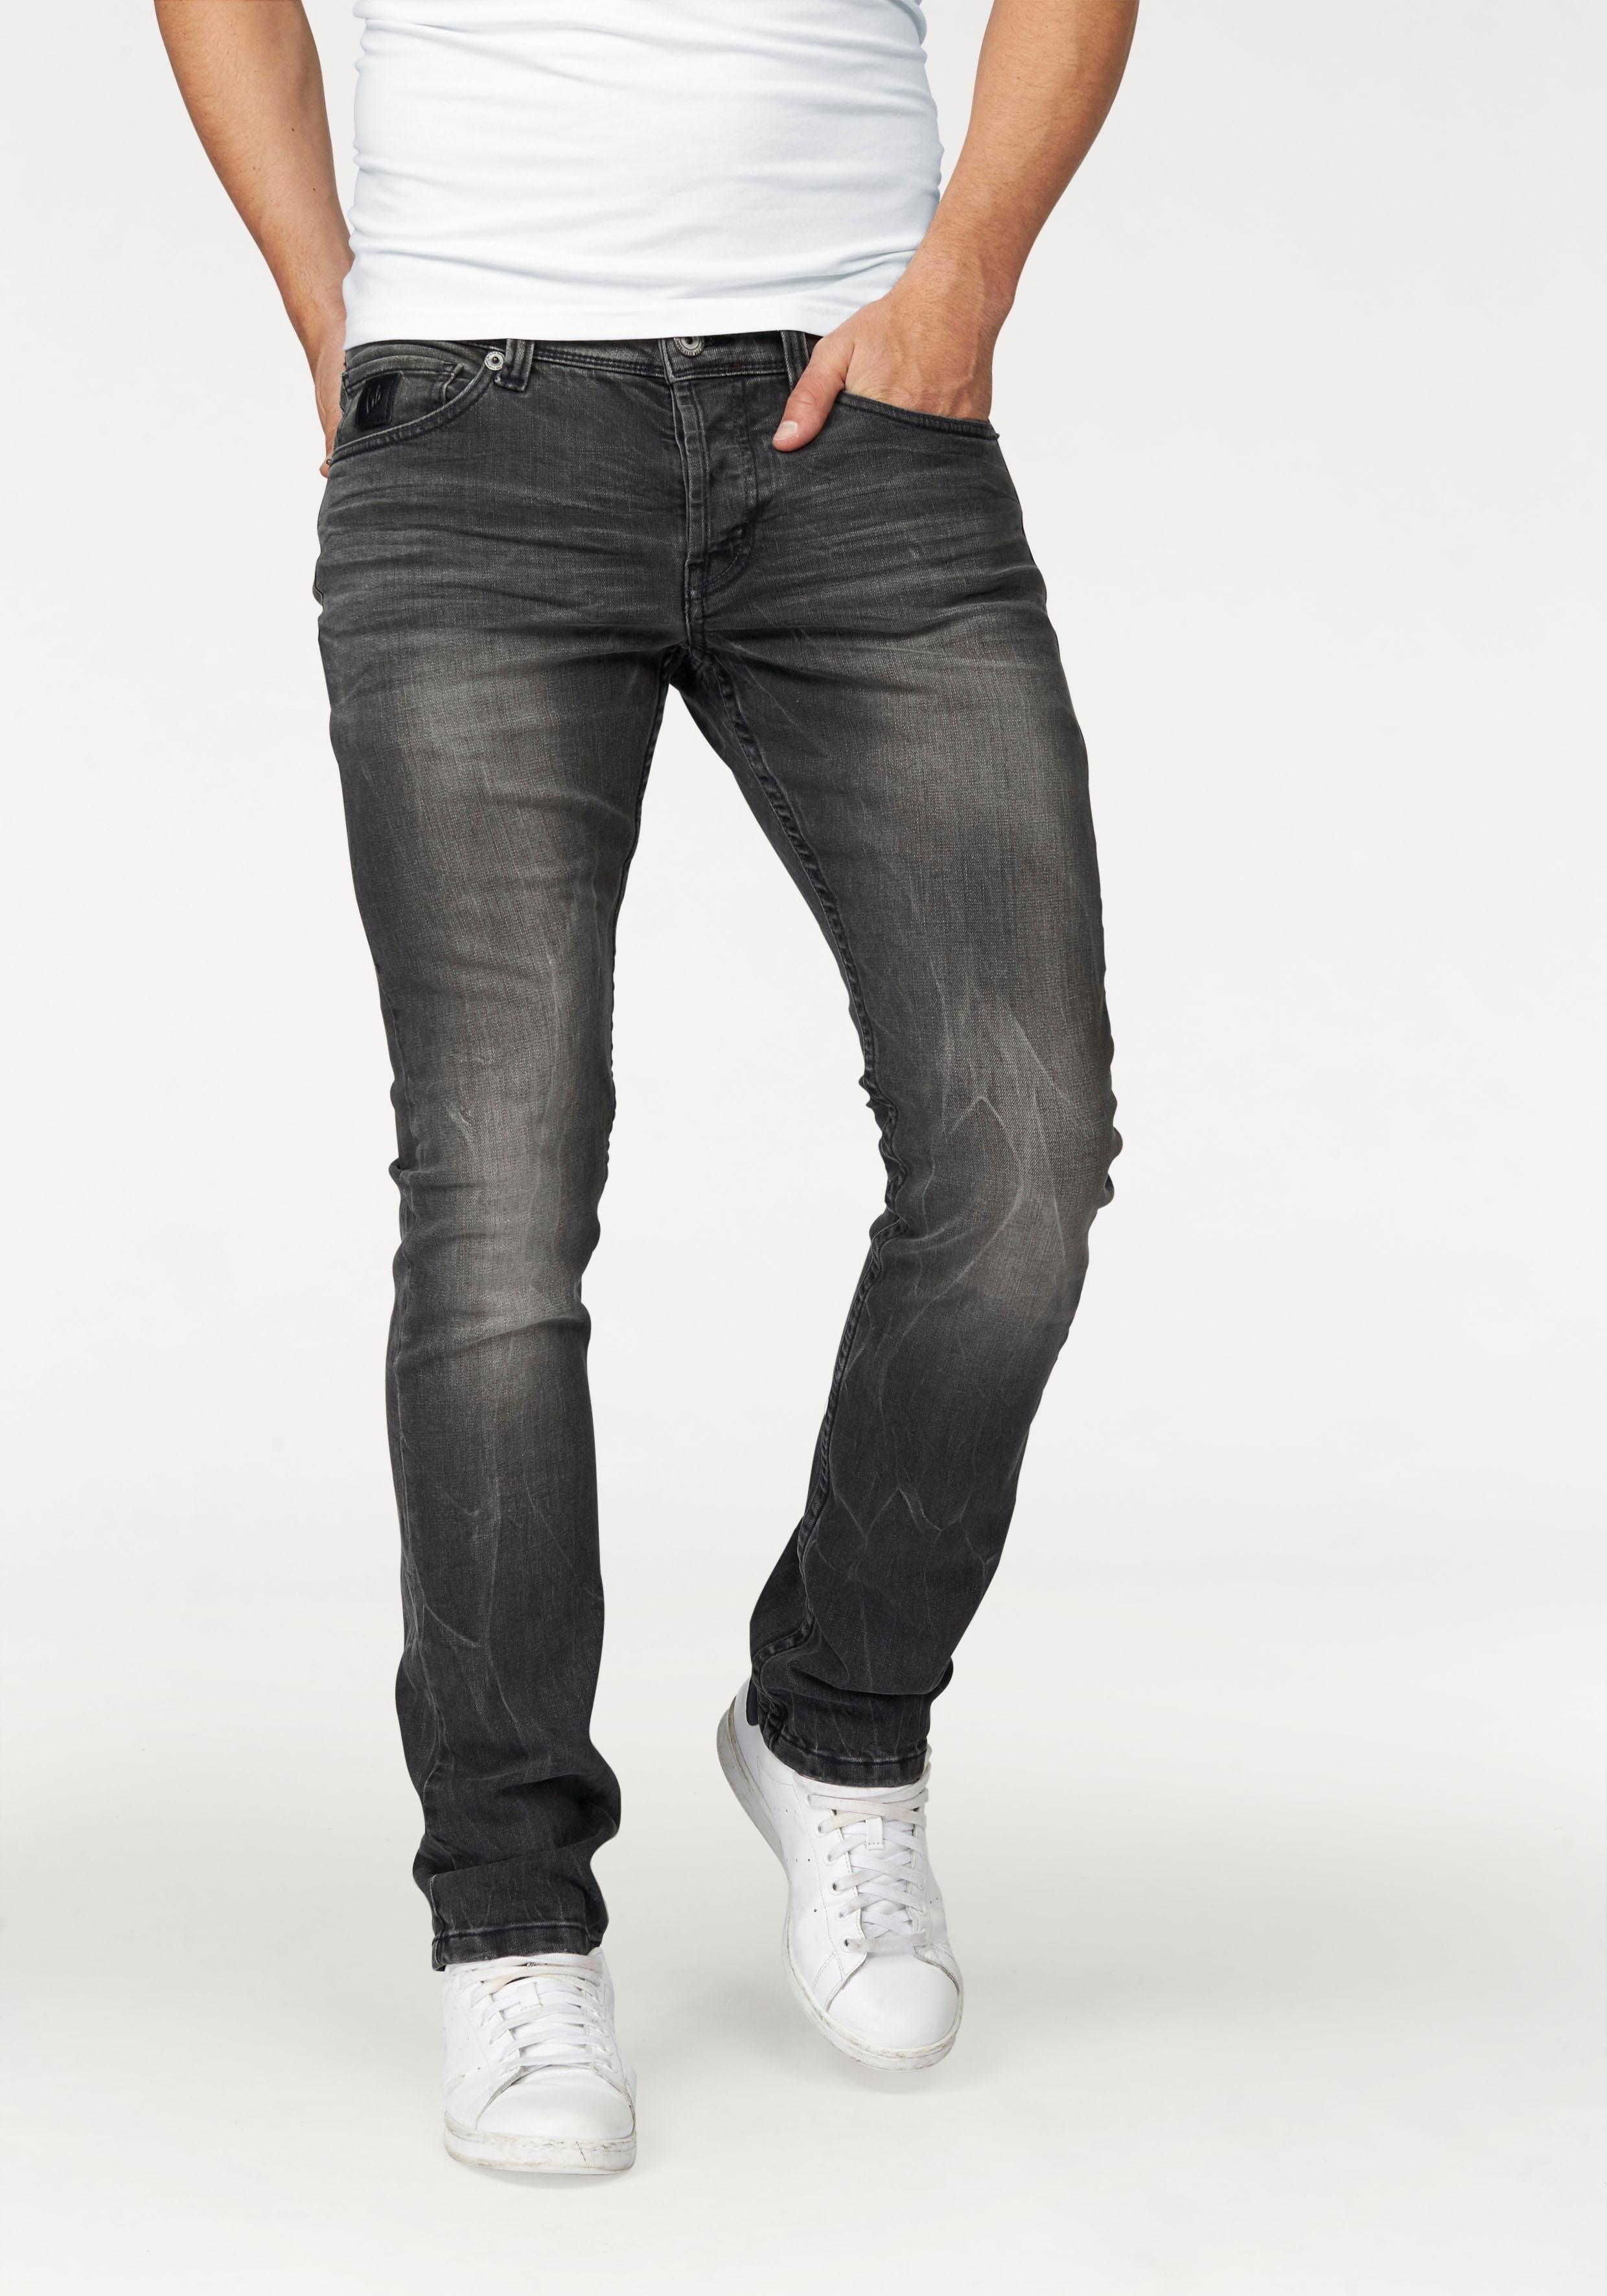 bruno banani Slim Fit-jeans Jimmy nu online kopen bij OTTO